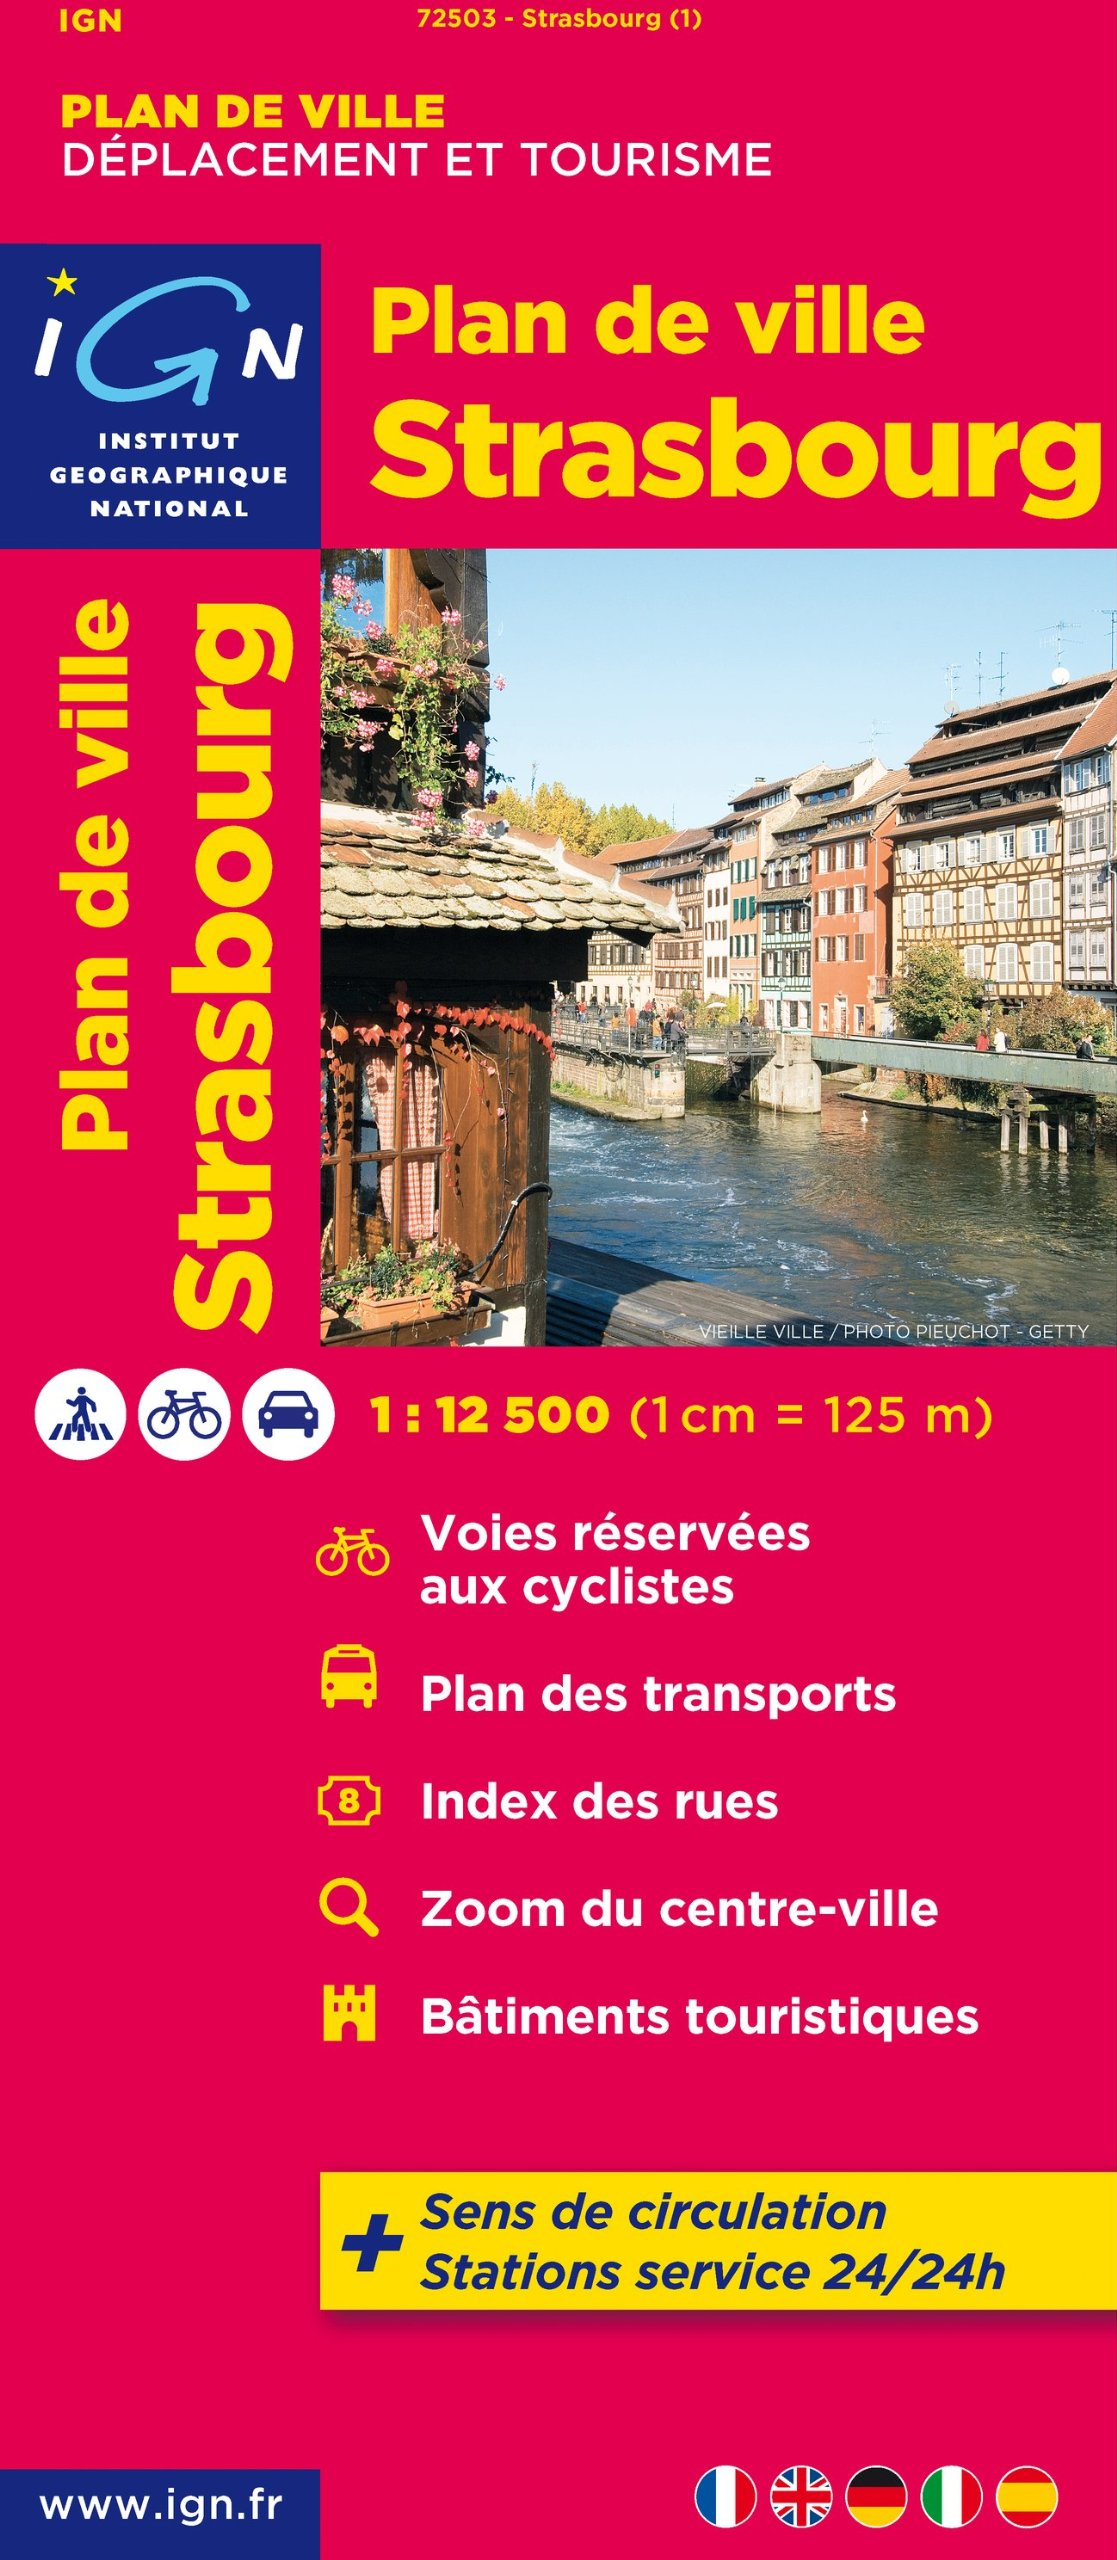 Strassbourg: IGN72503 (Ign Map)